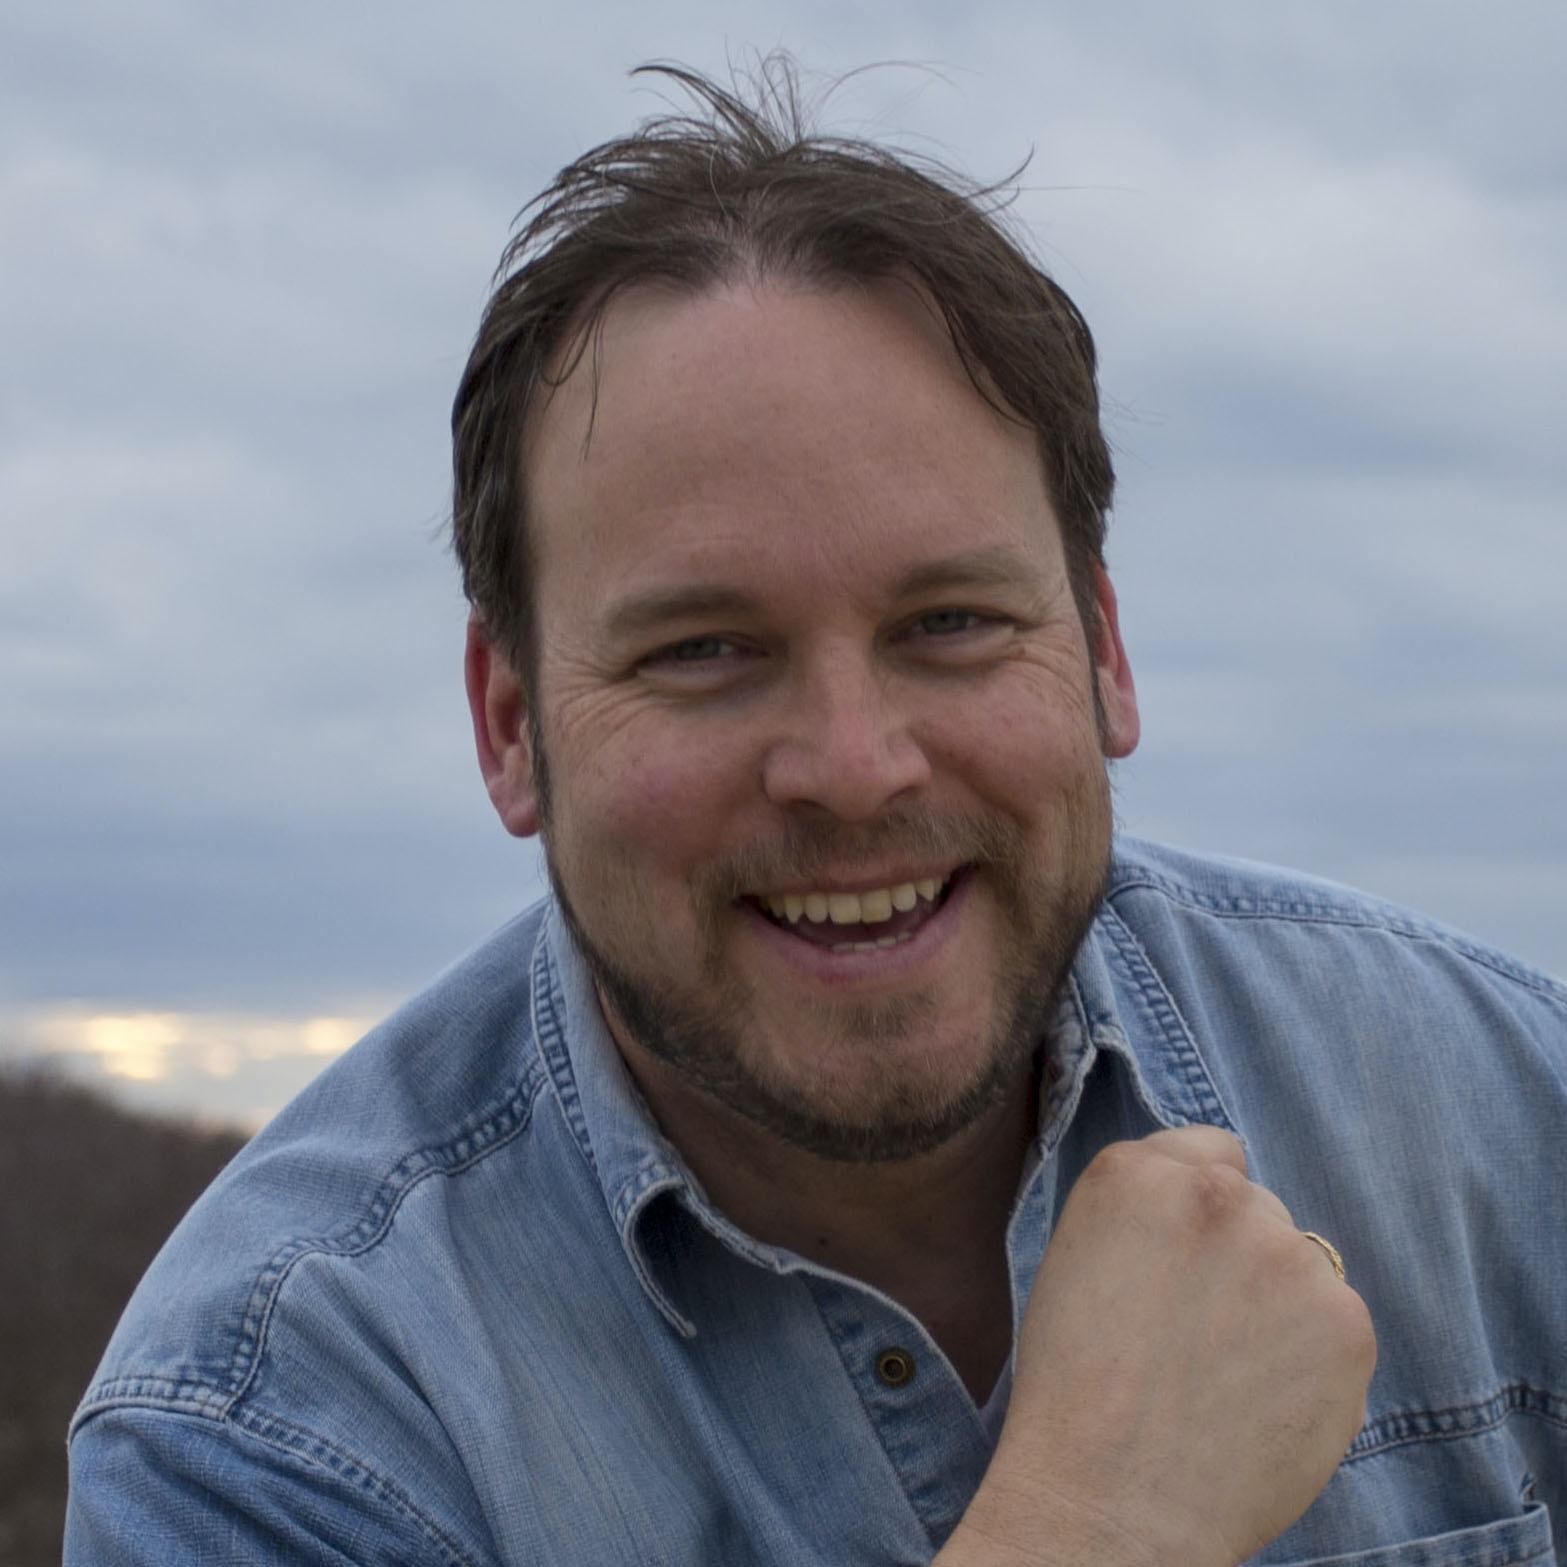 Avatar of user Keith Luke